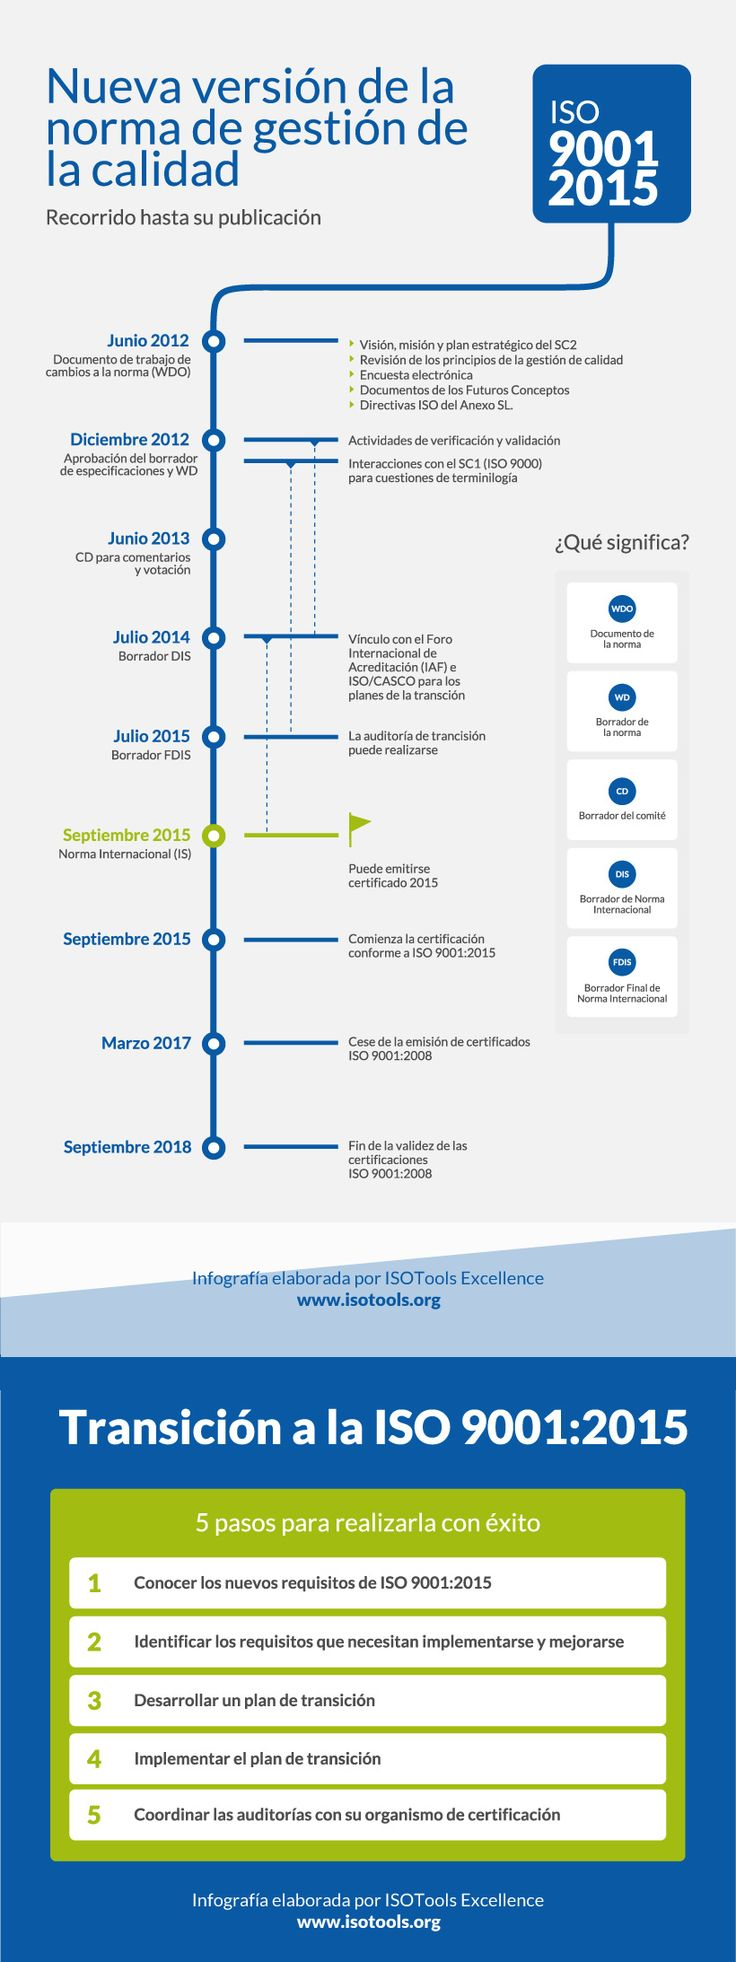 ISO 9001-2015 #infografia #infographic #calidad